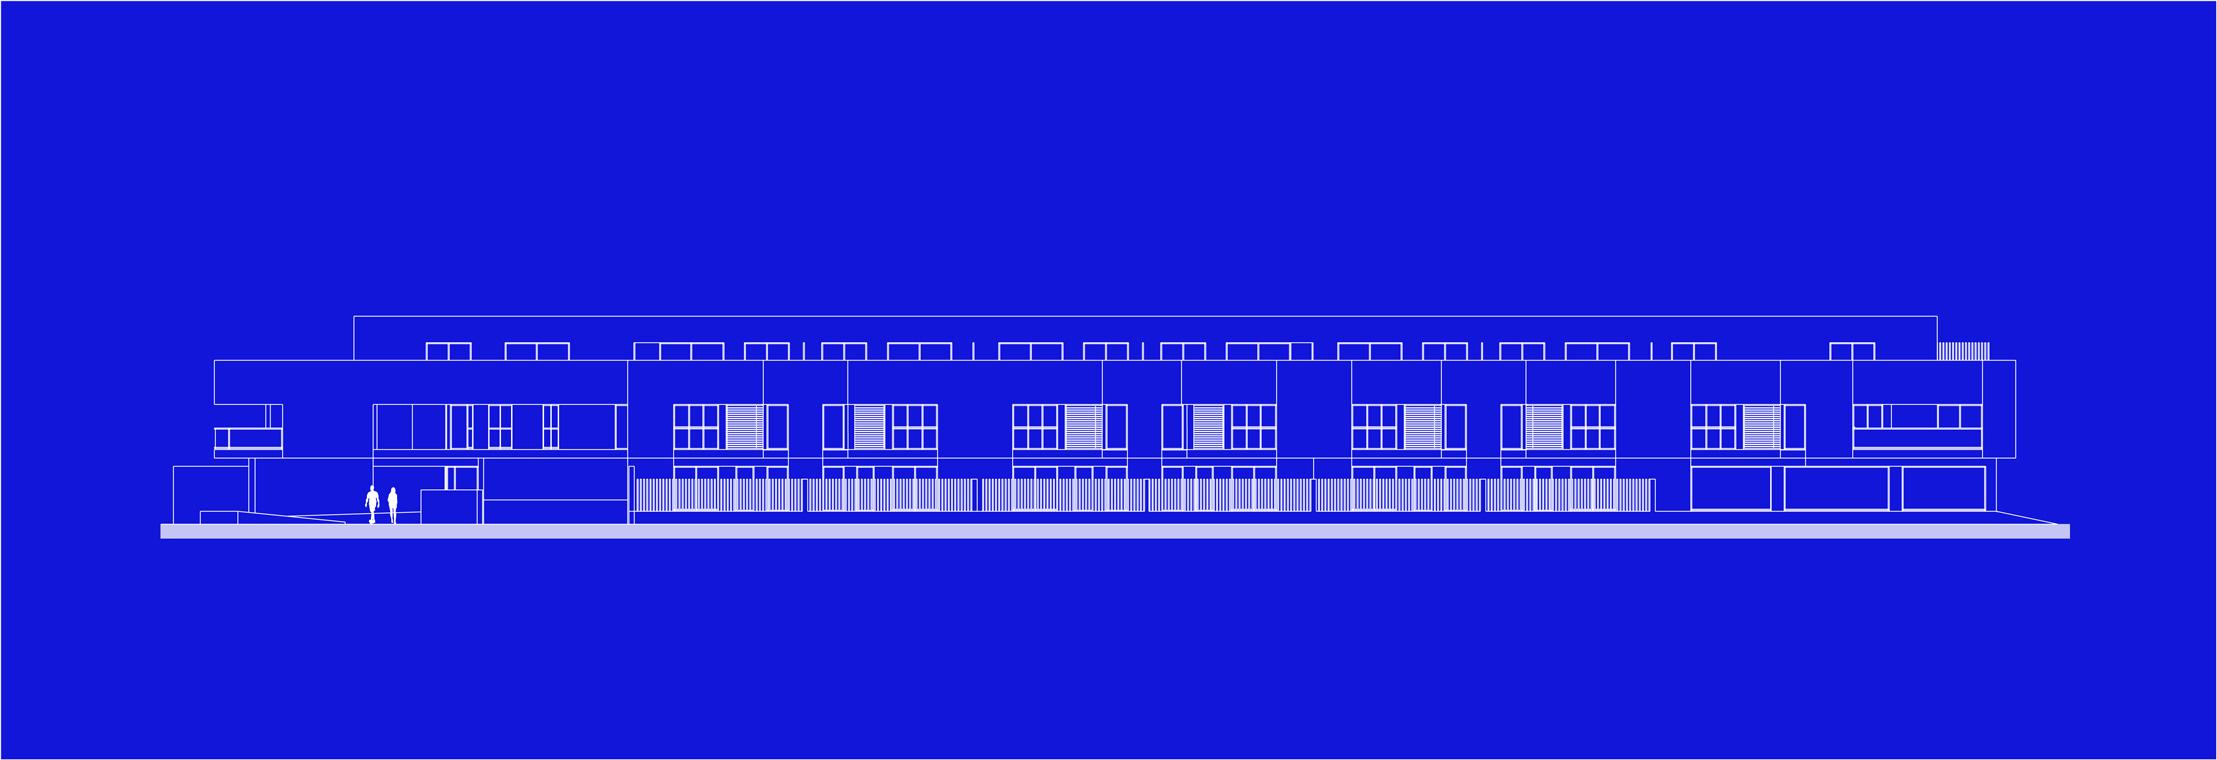 loma-alzado-azulw